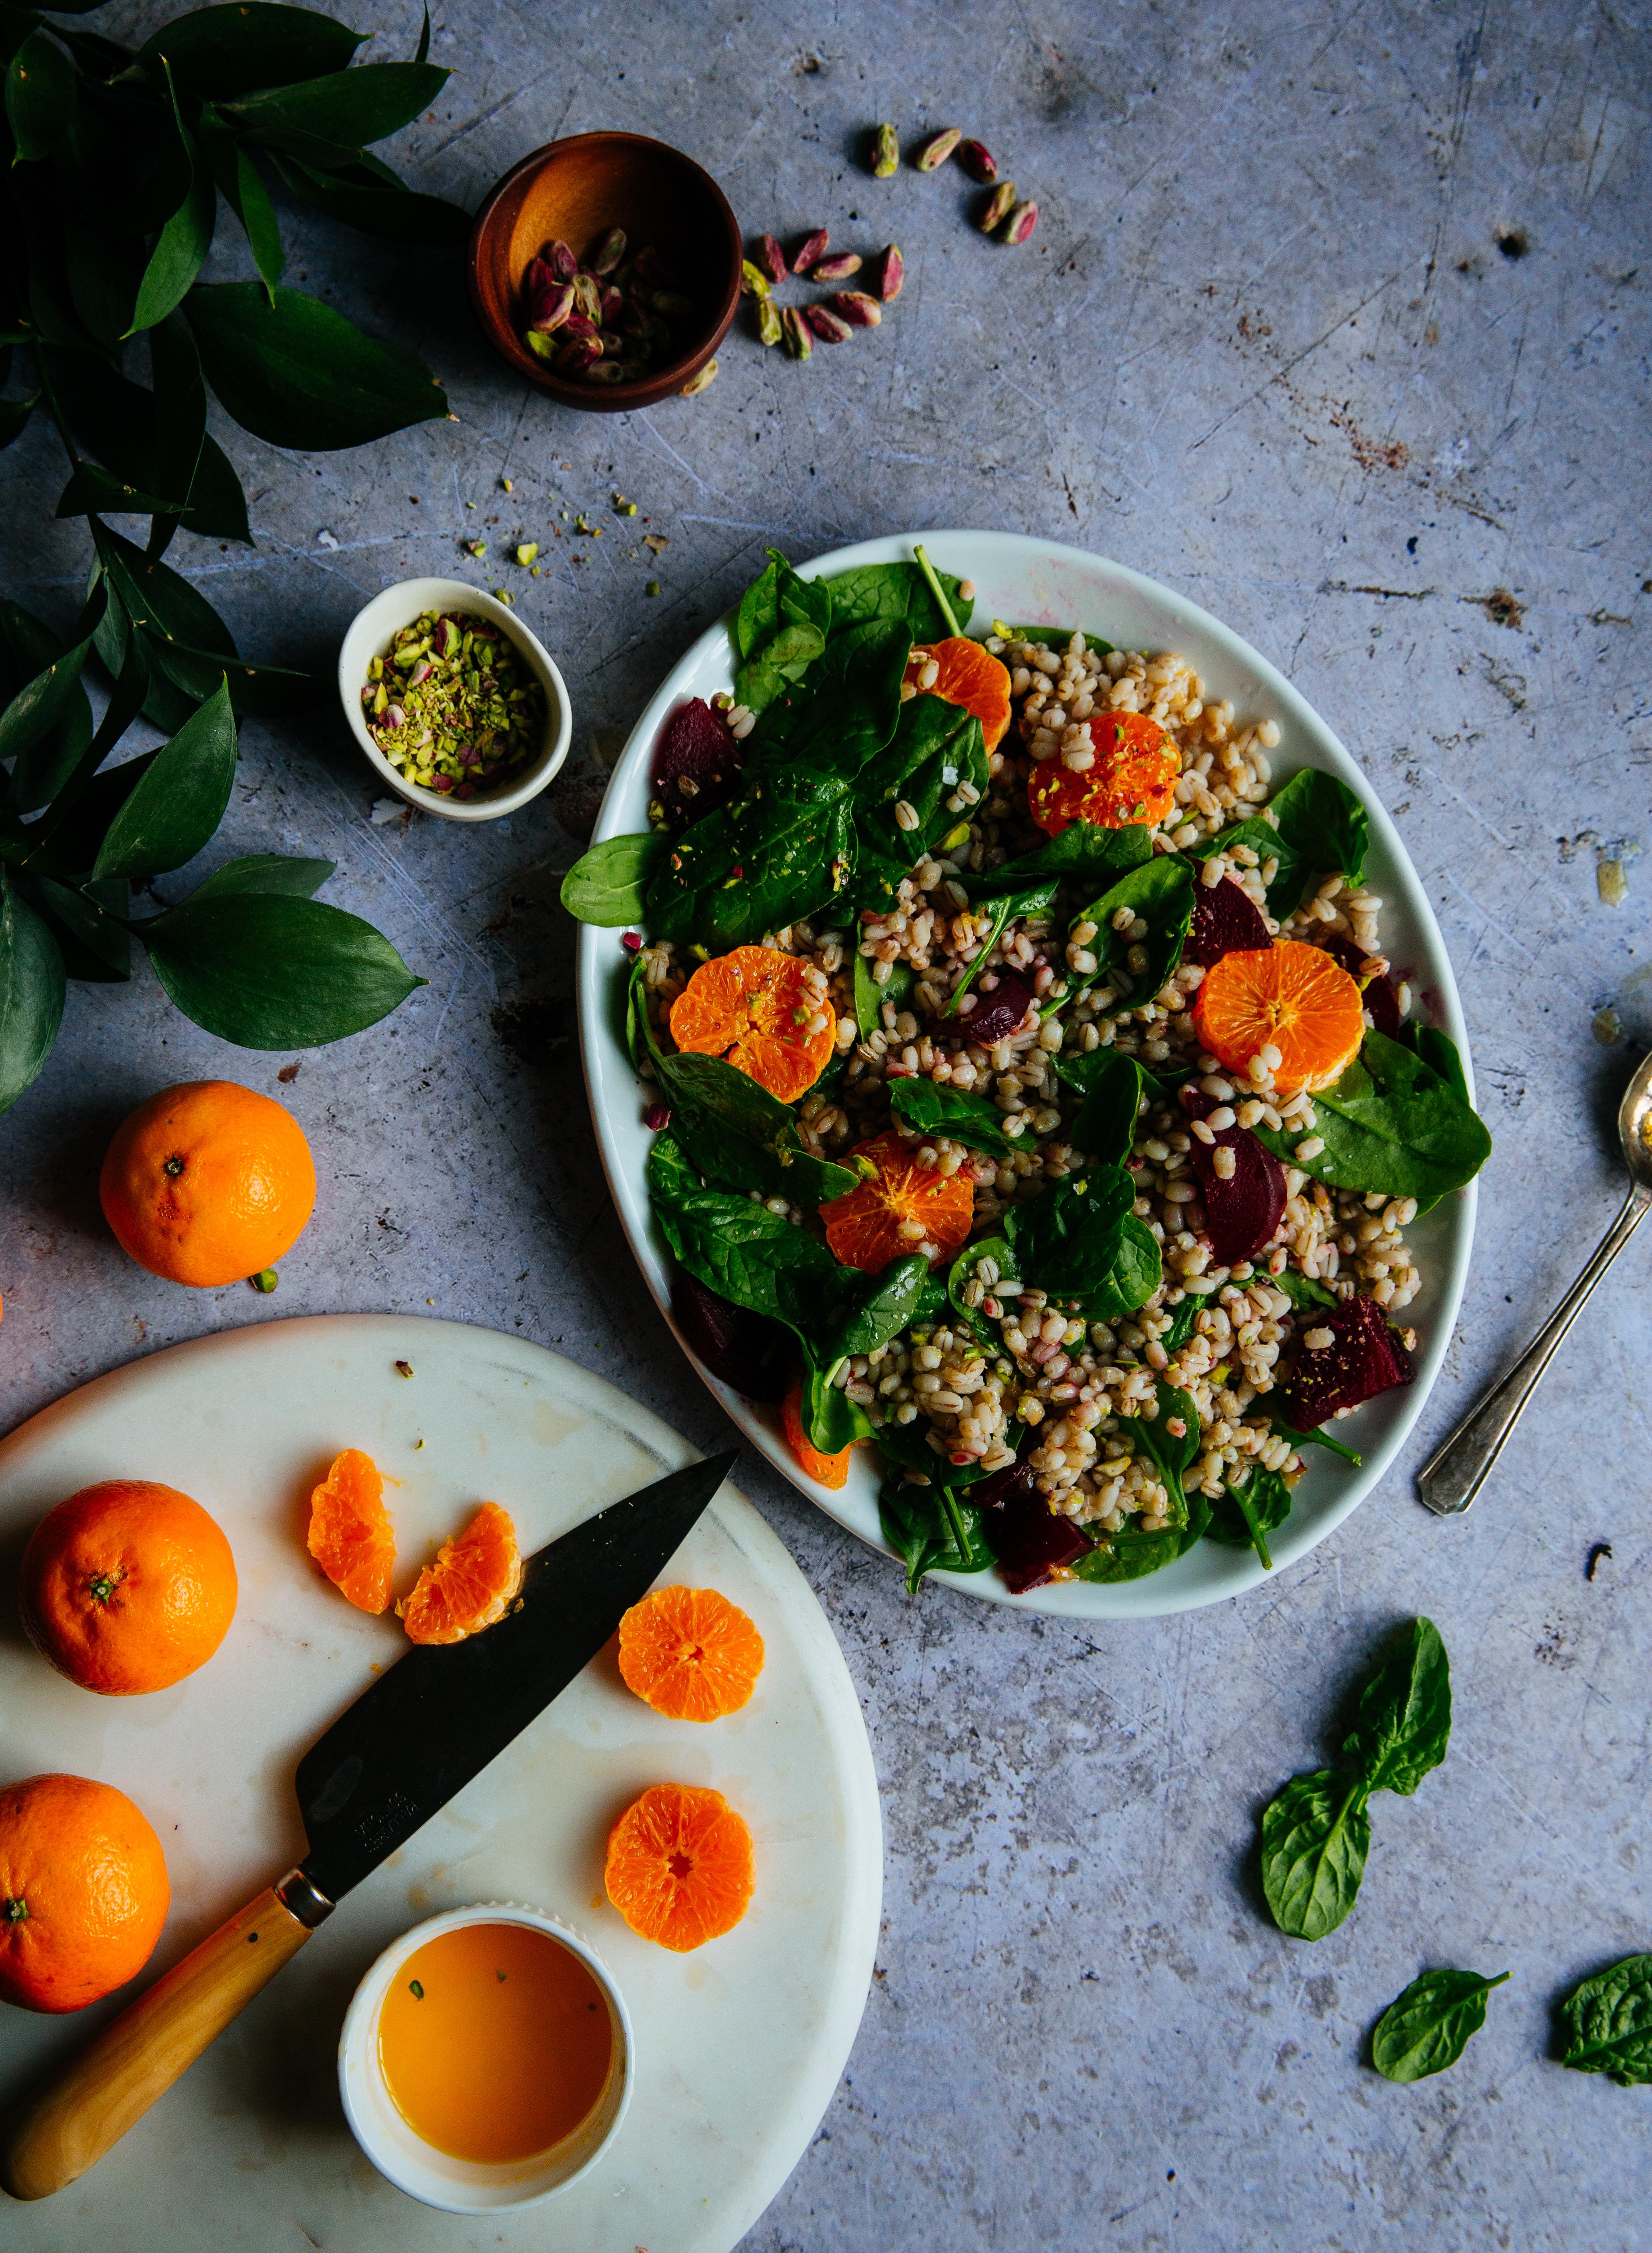 Mandarine, beet & pistachio barley salad